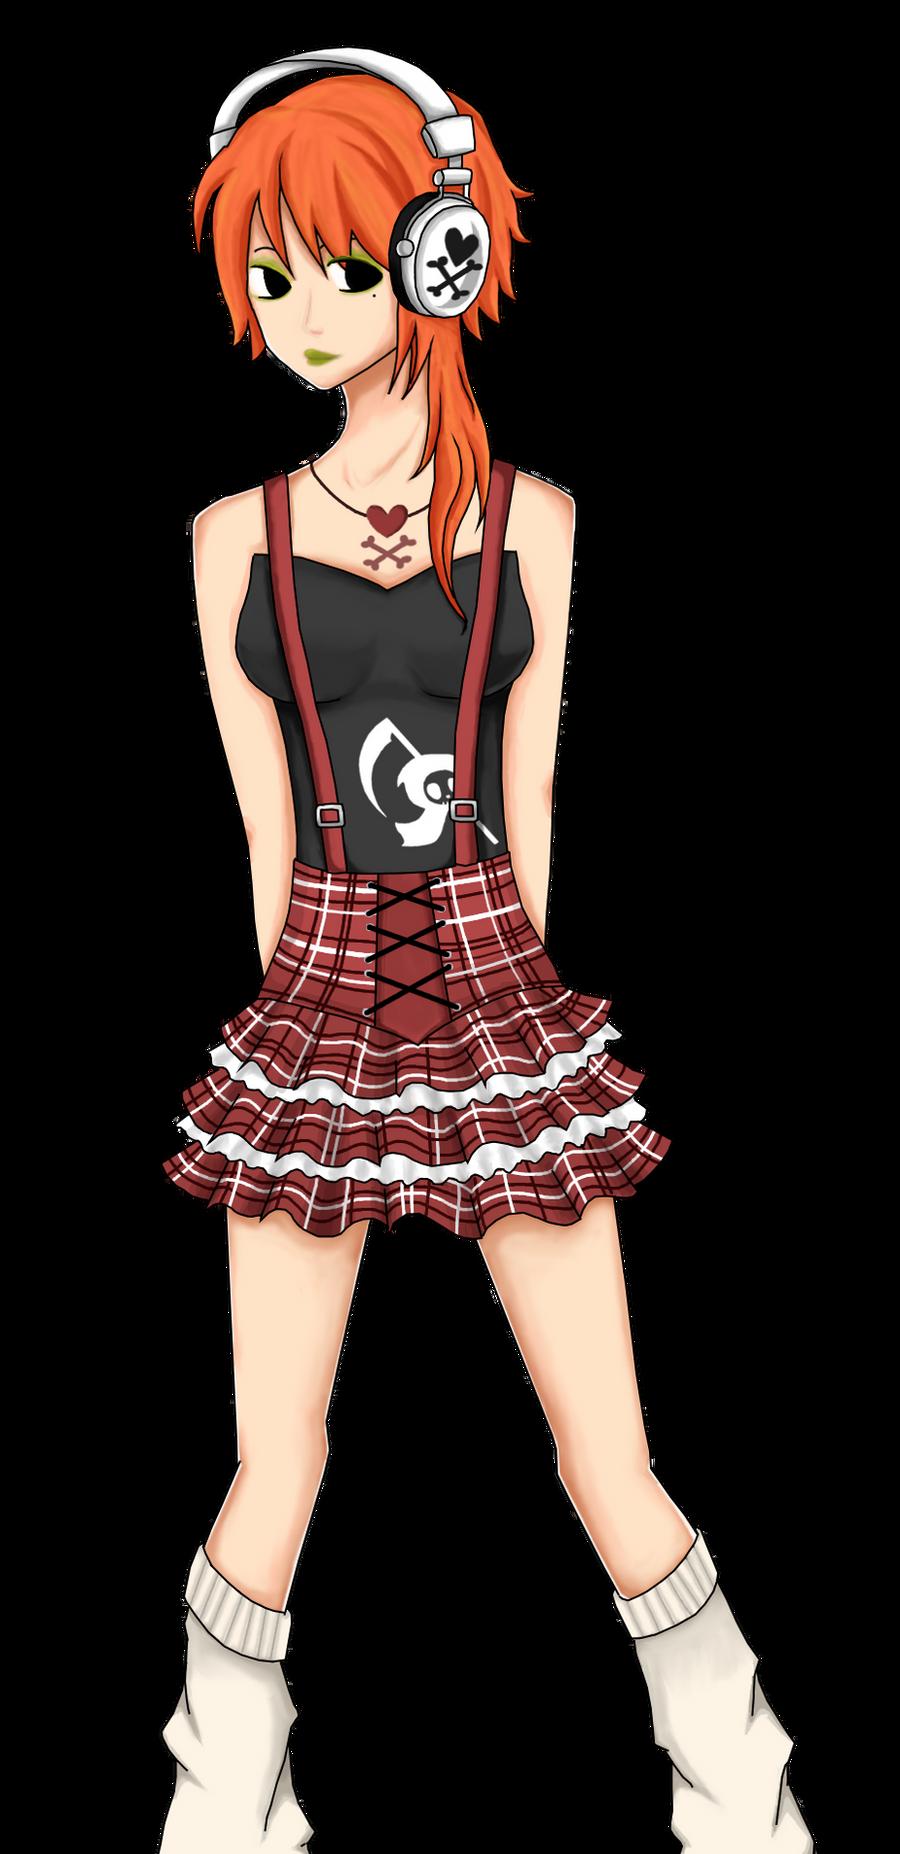 TokiDoki Girl by Spork-a-licious